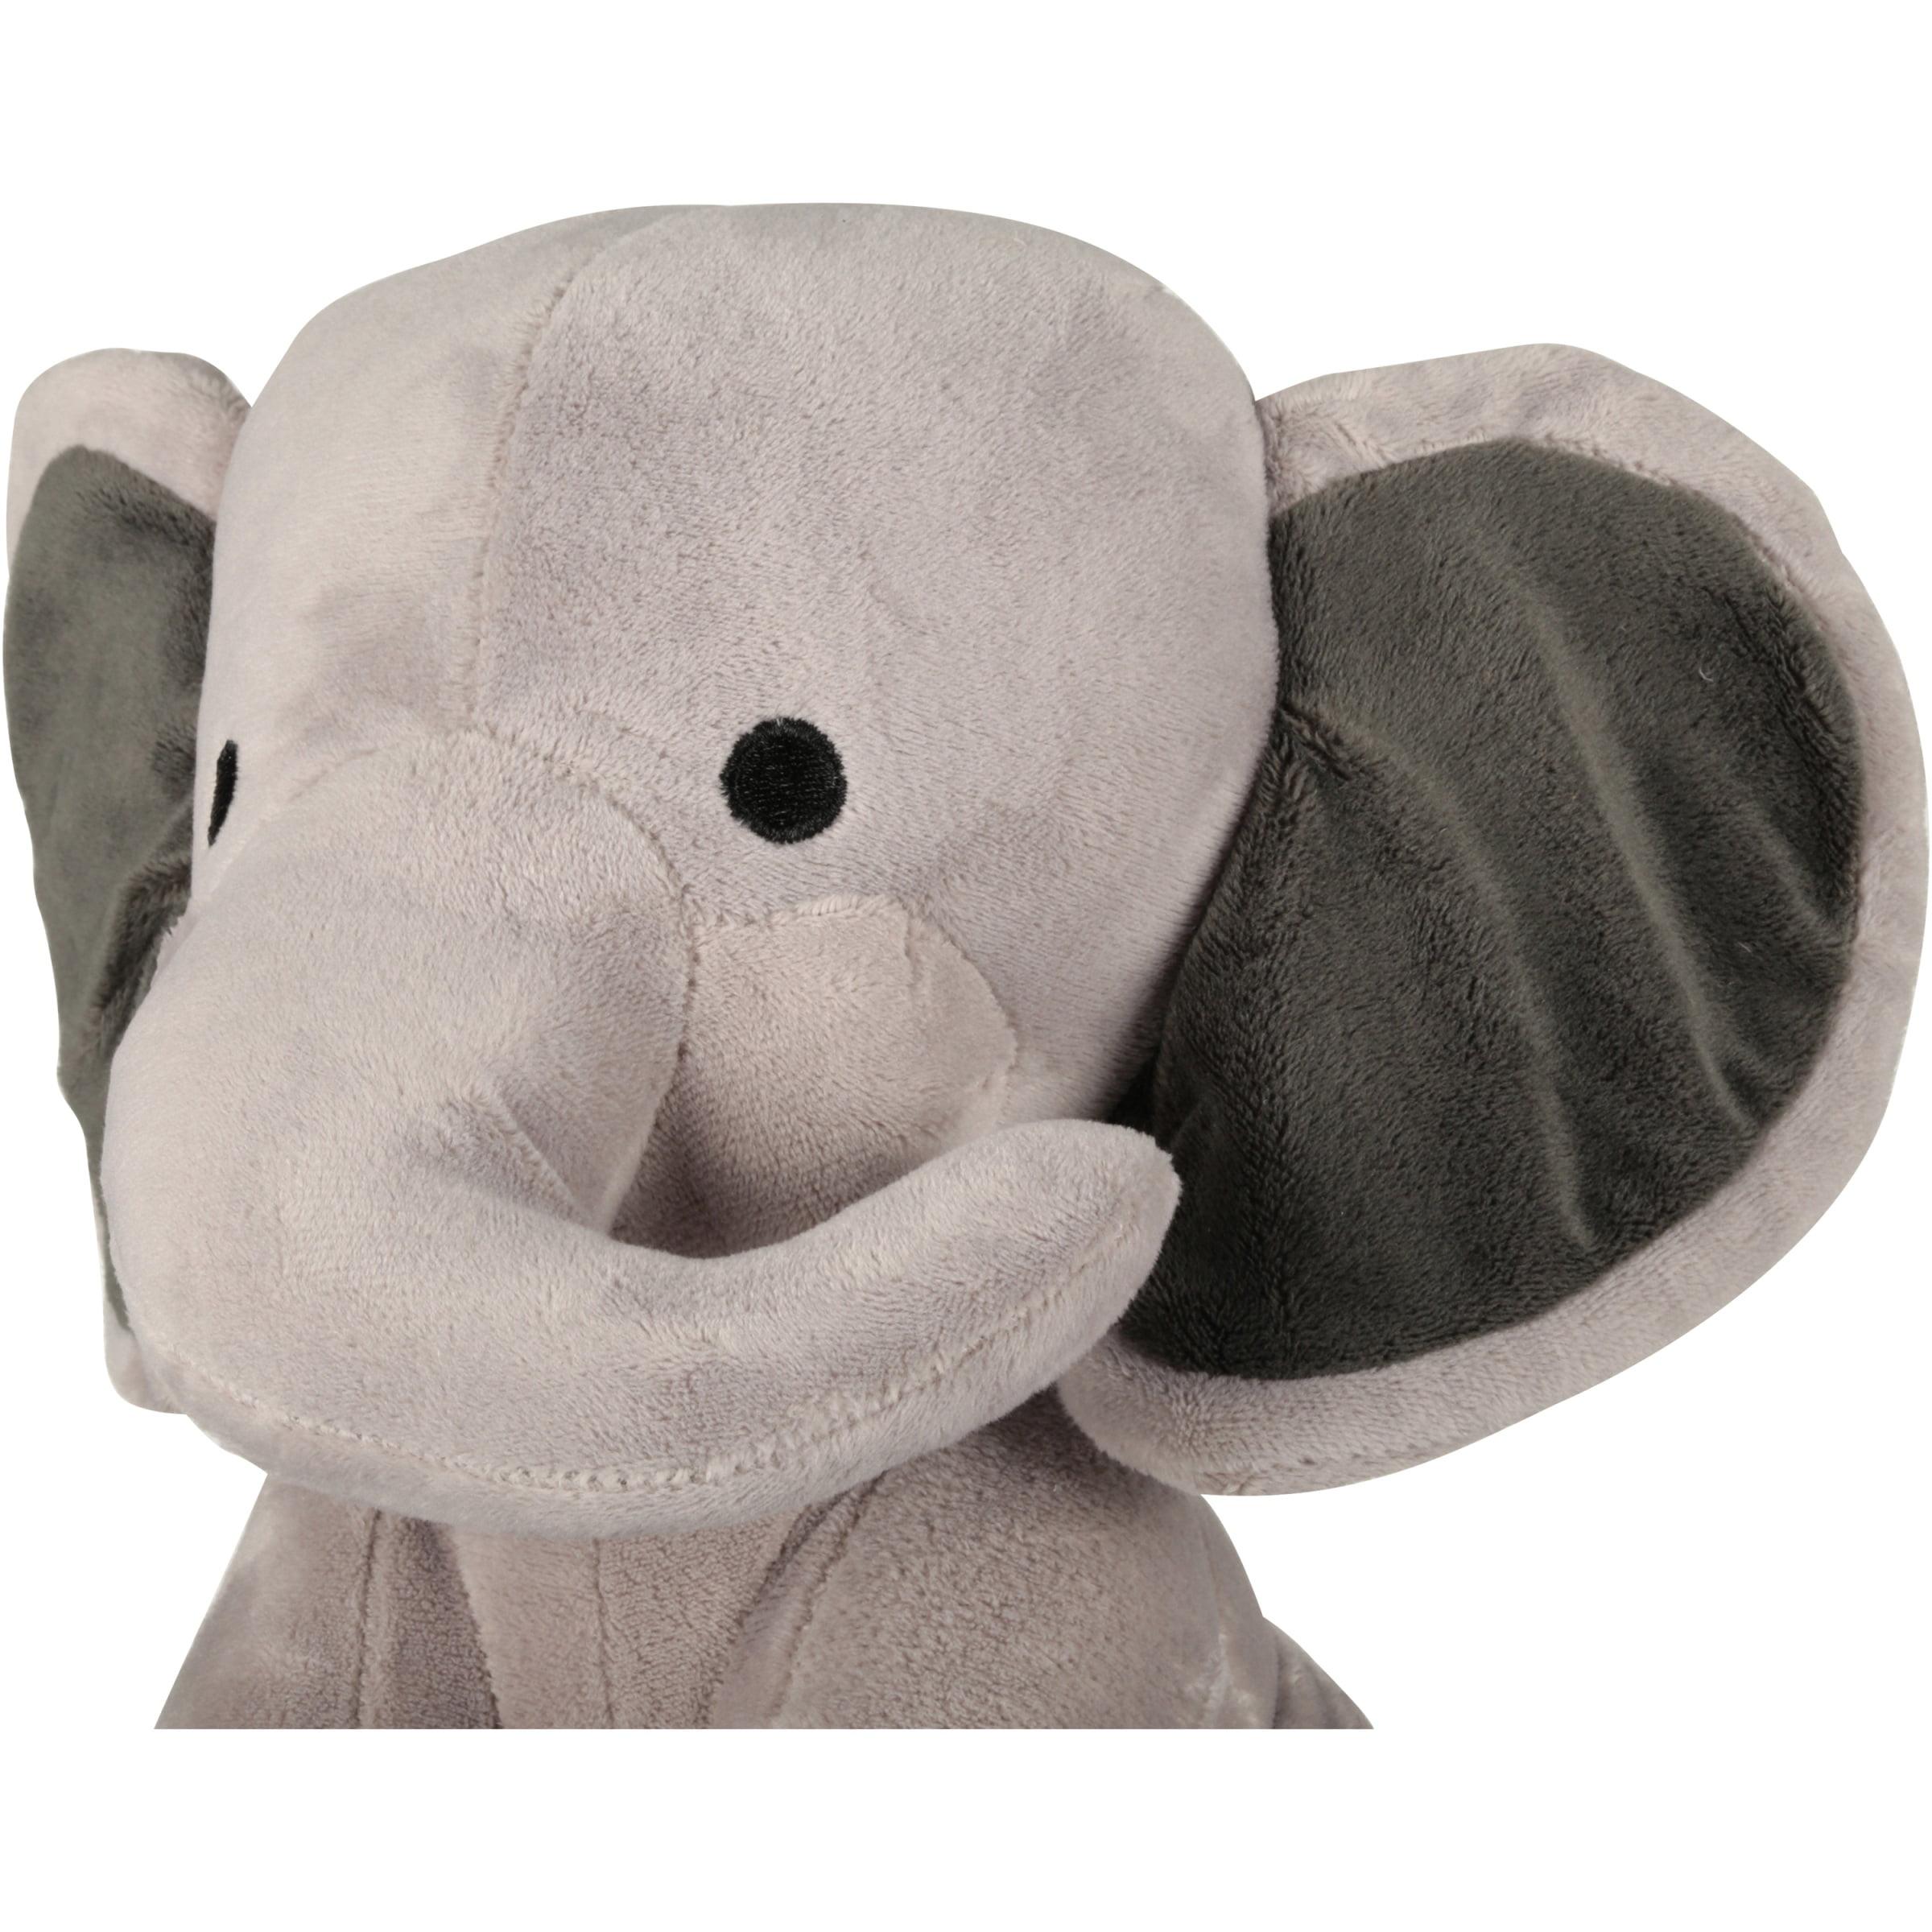 Plush Soft Elephant Toy Doll Humphrey Baby Children Boy Girl Hug